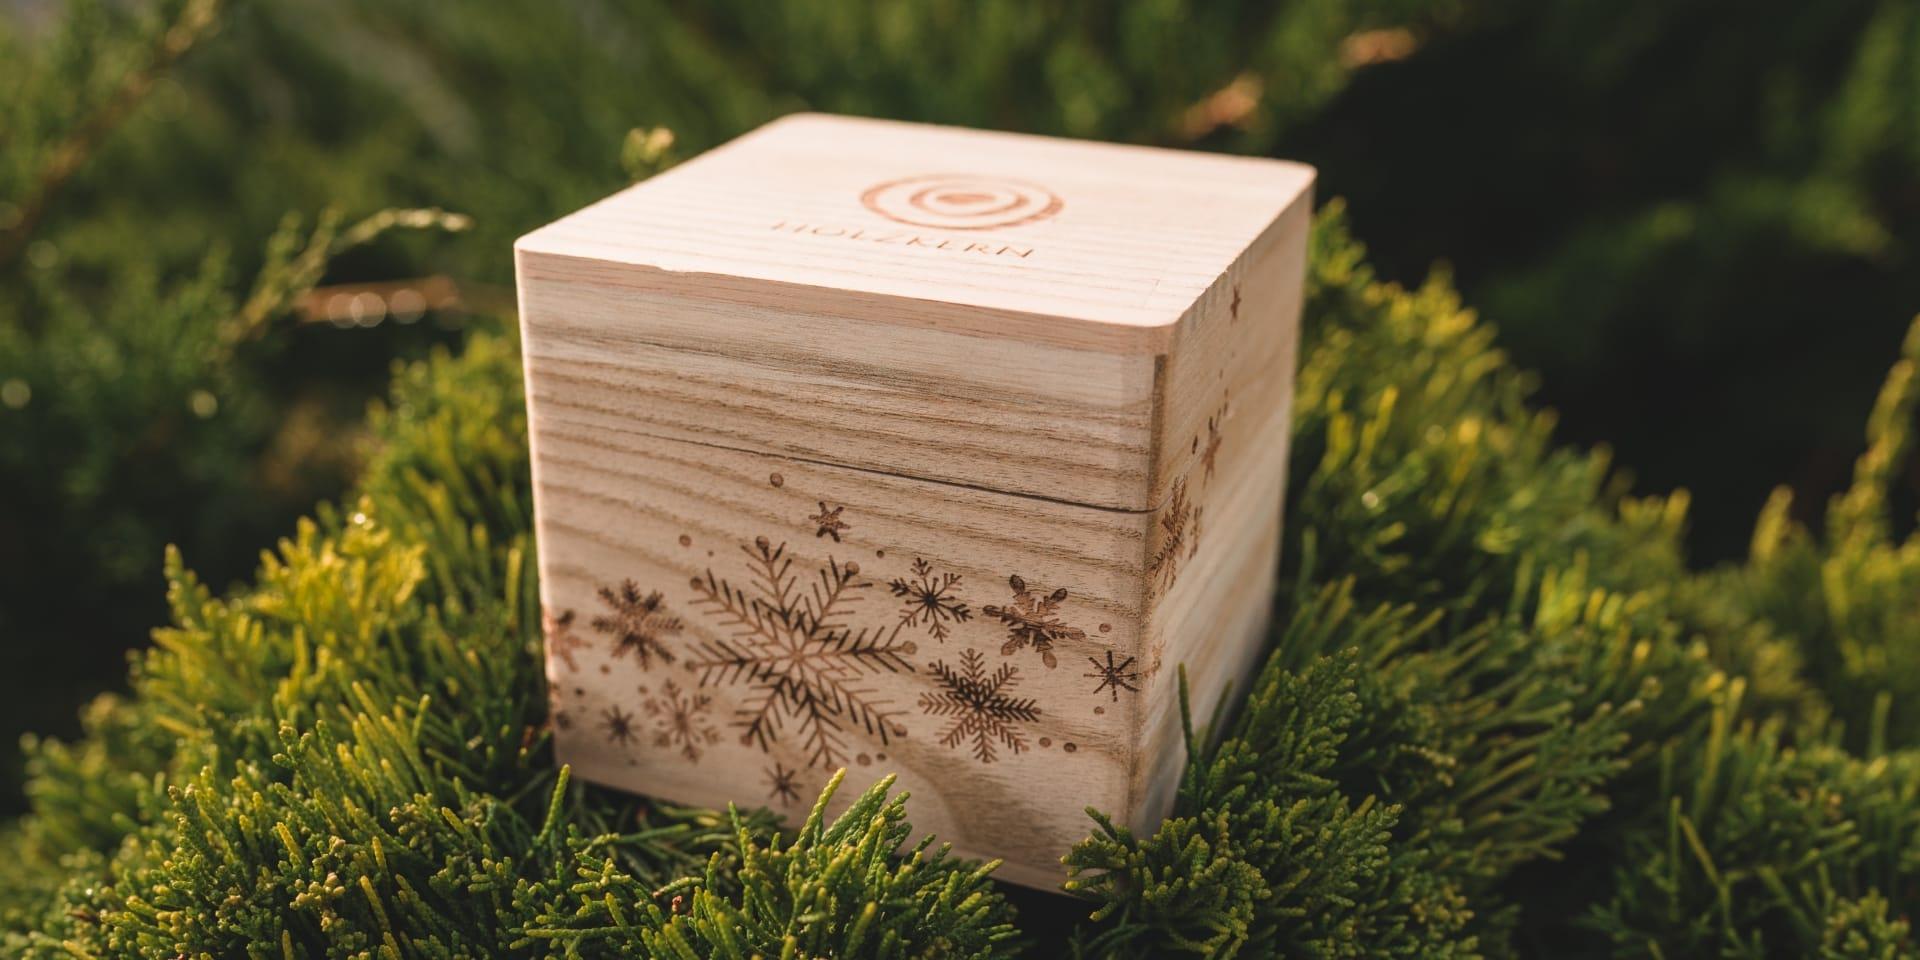 More than 600 unique Holzkern Designs